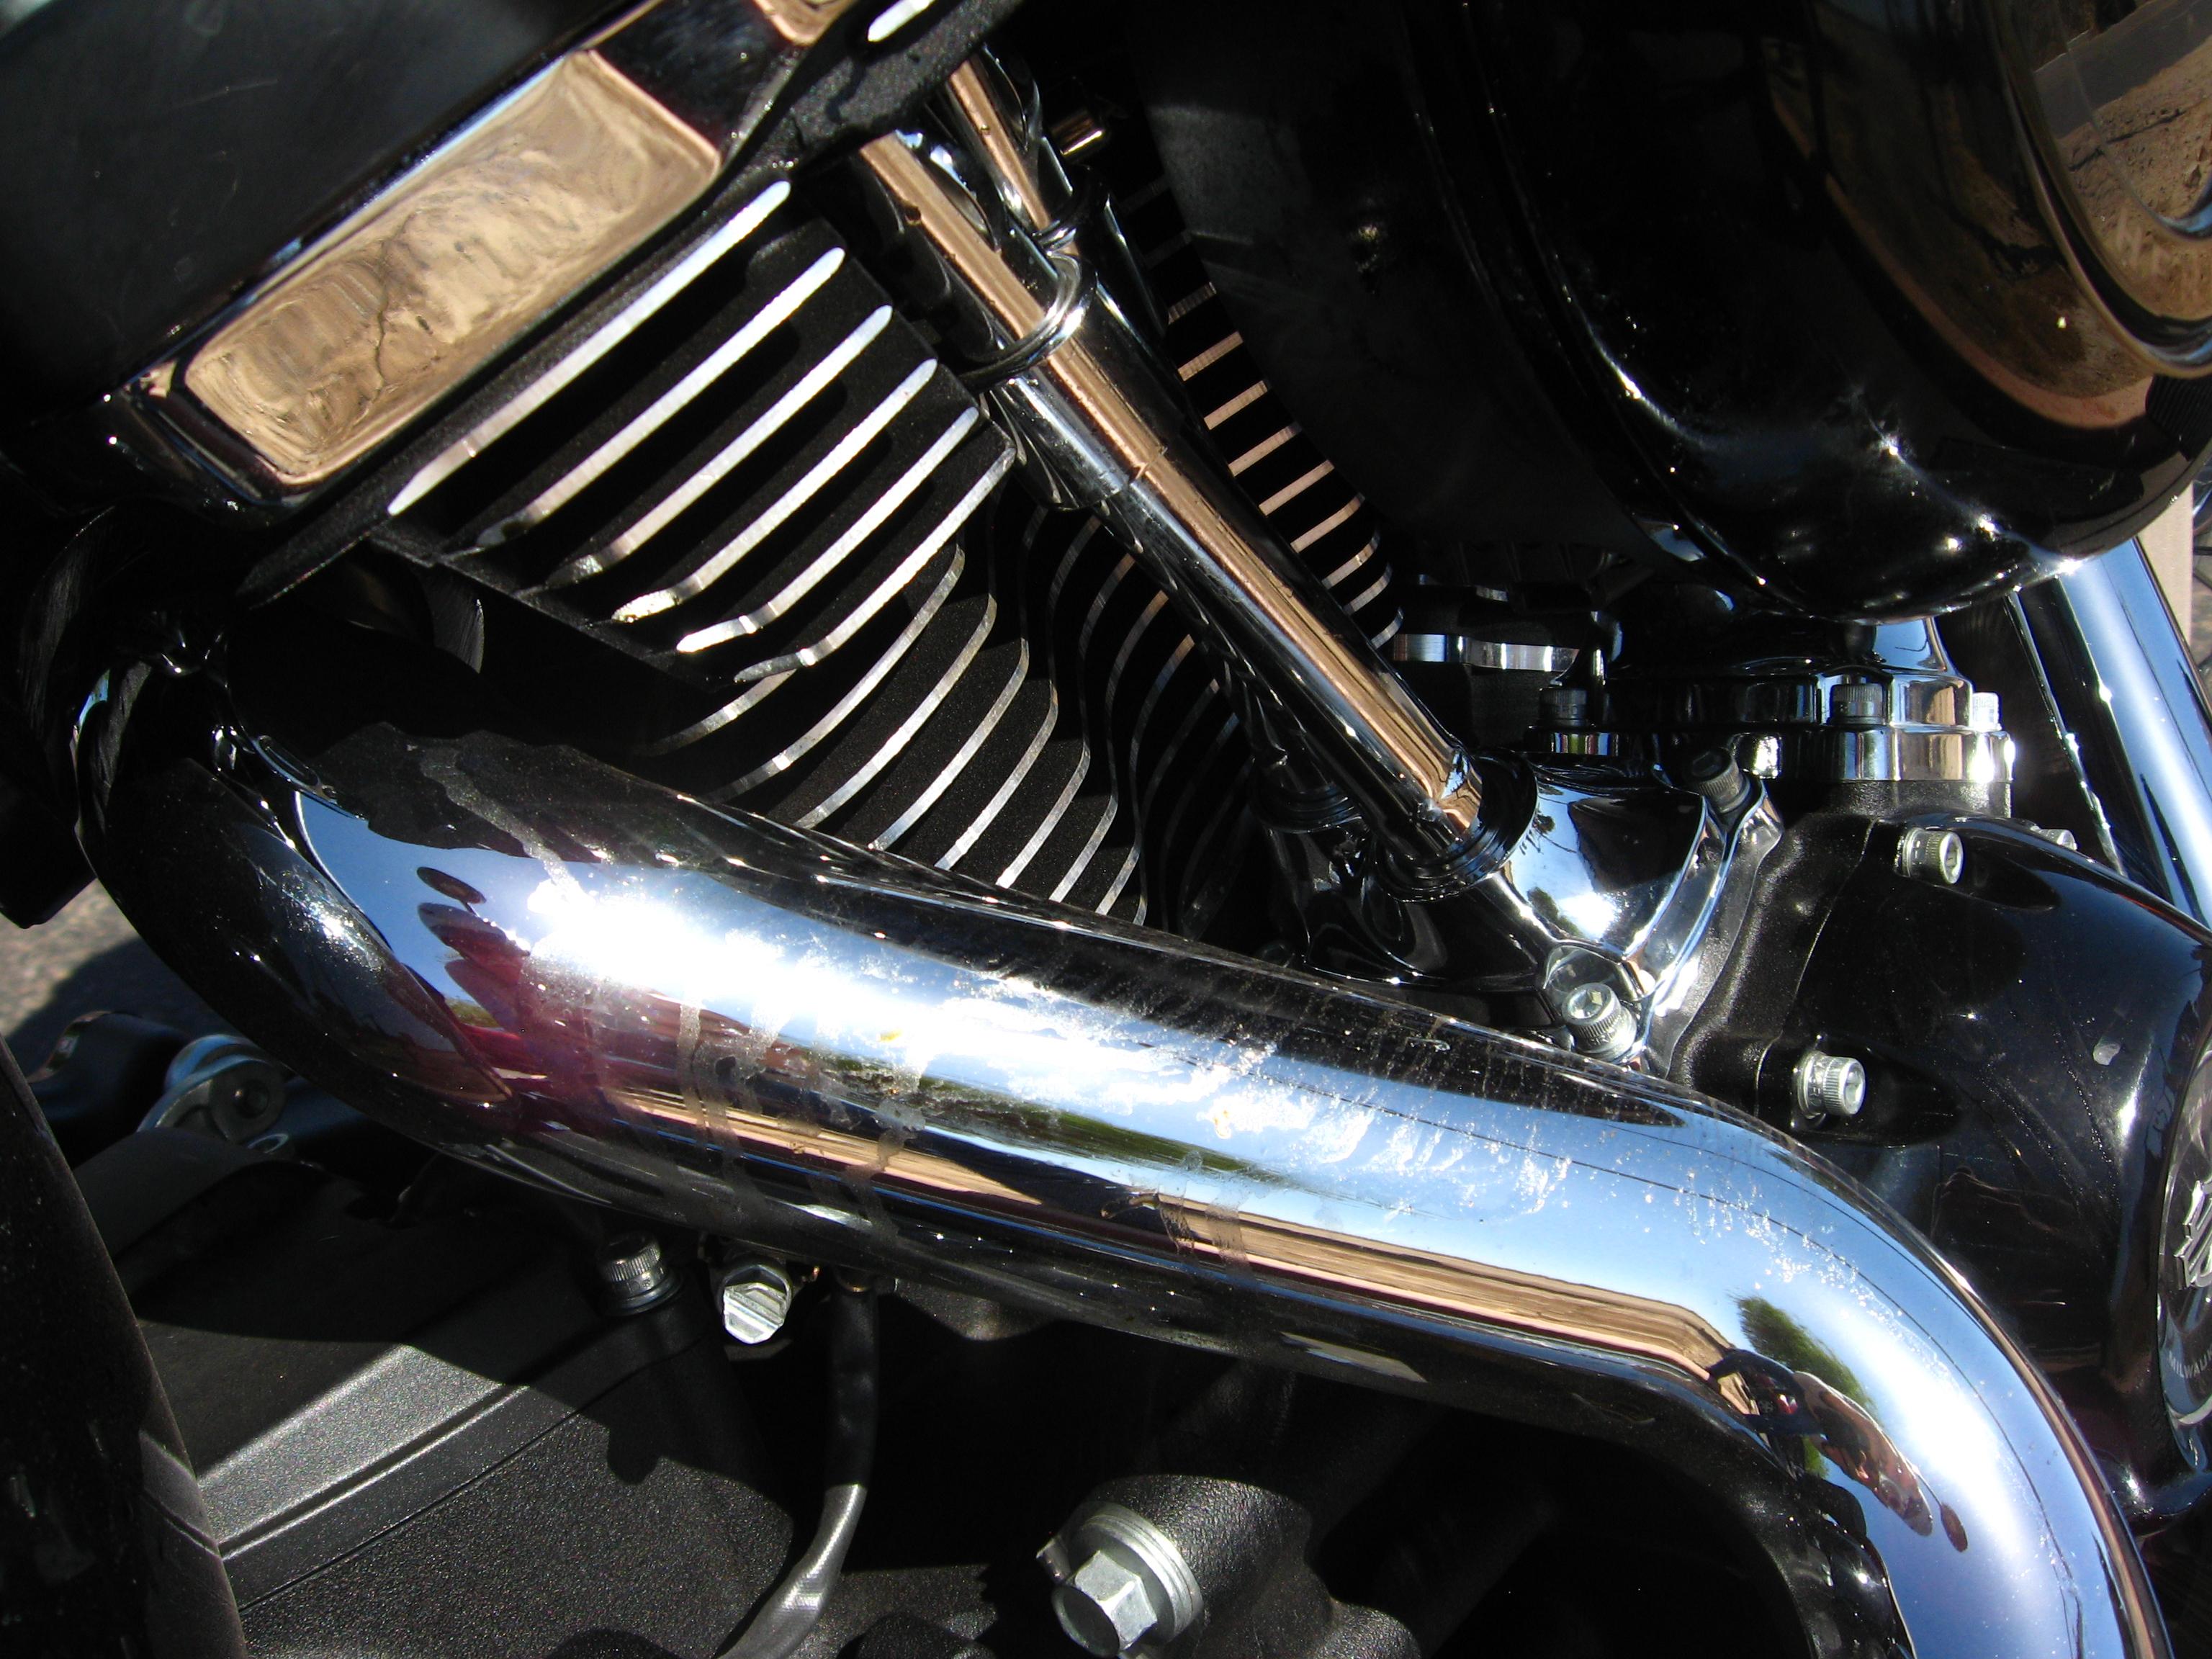 2018 Harley-Davidson Heritage Softail Classic vs My 2014